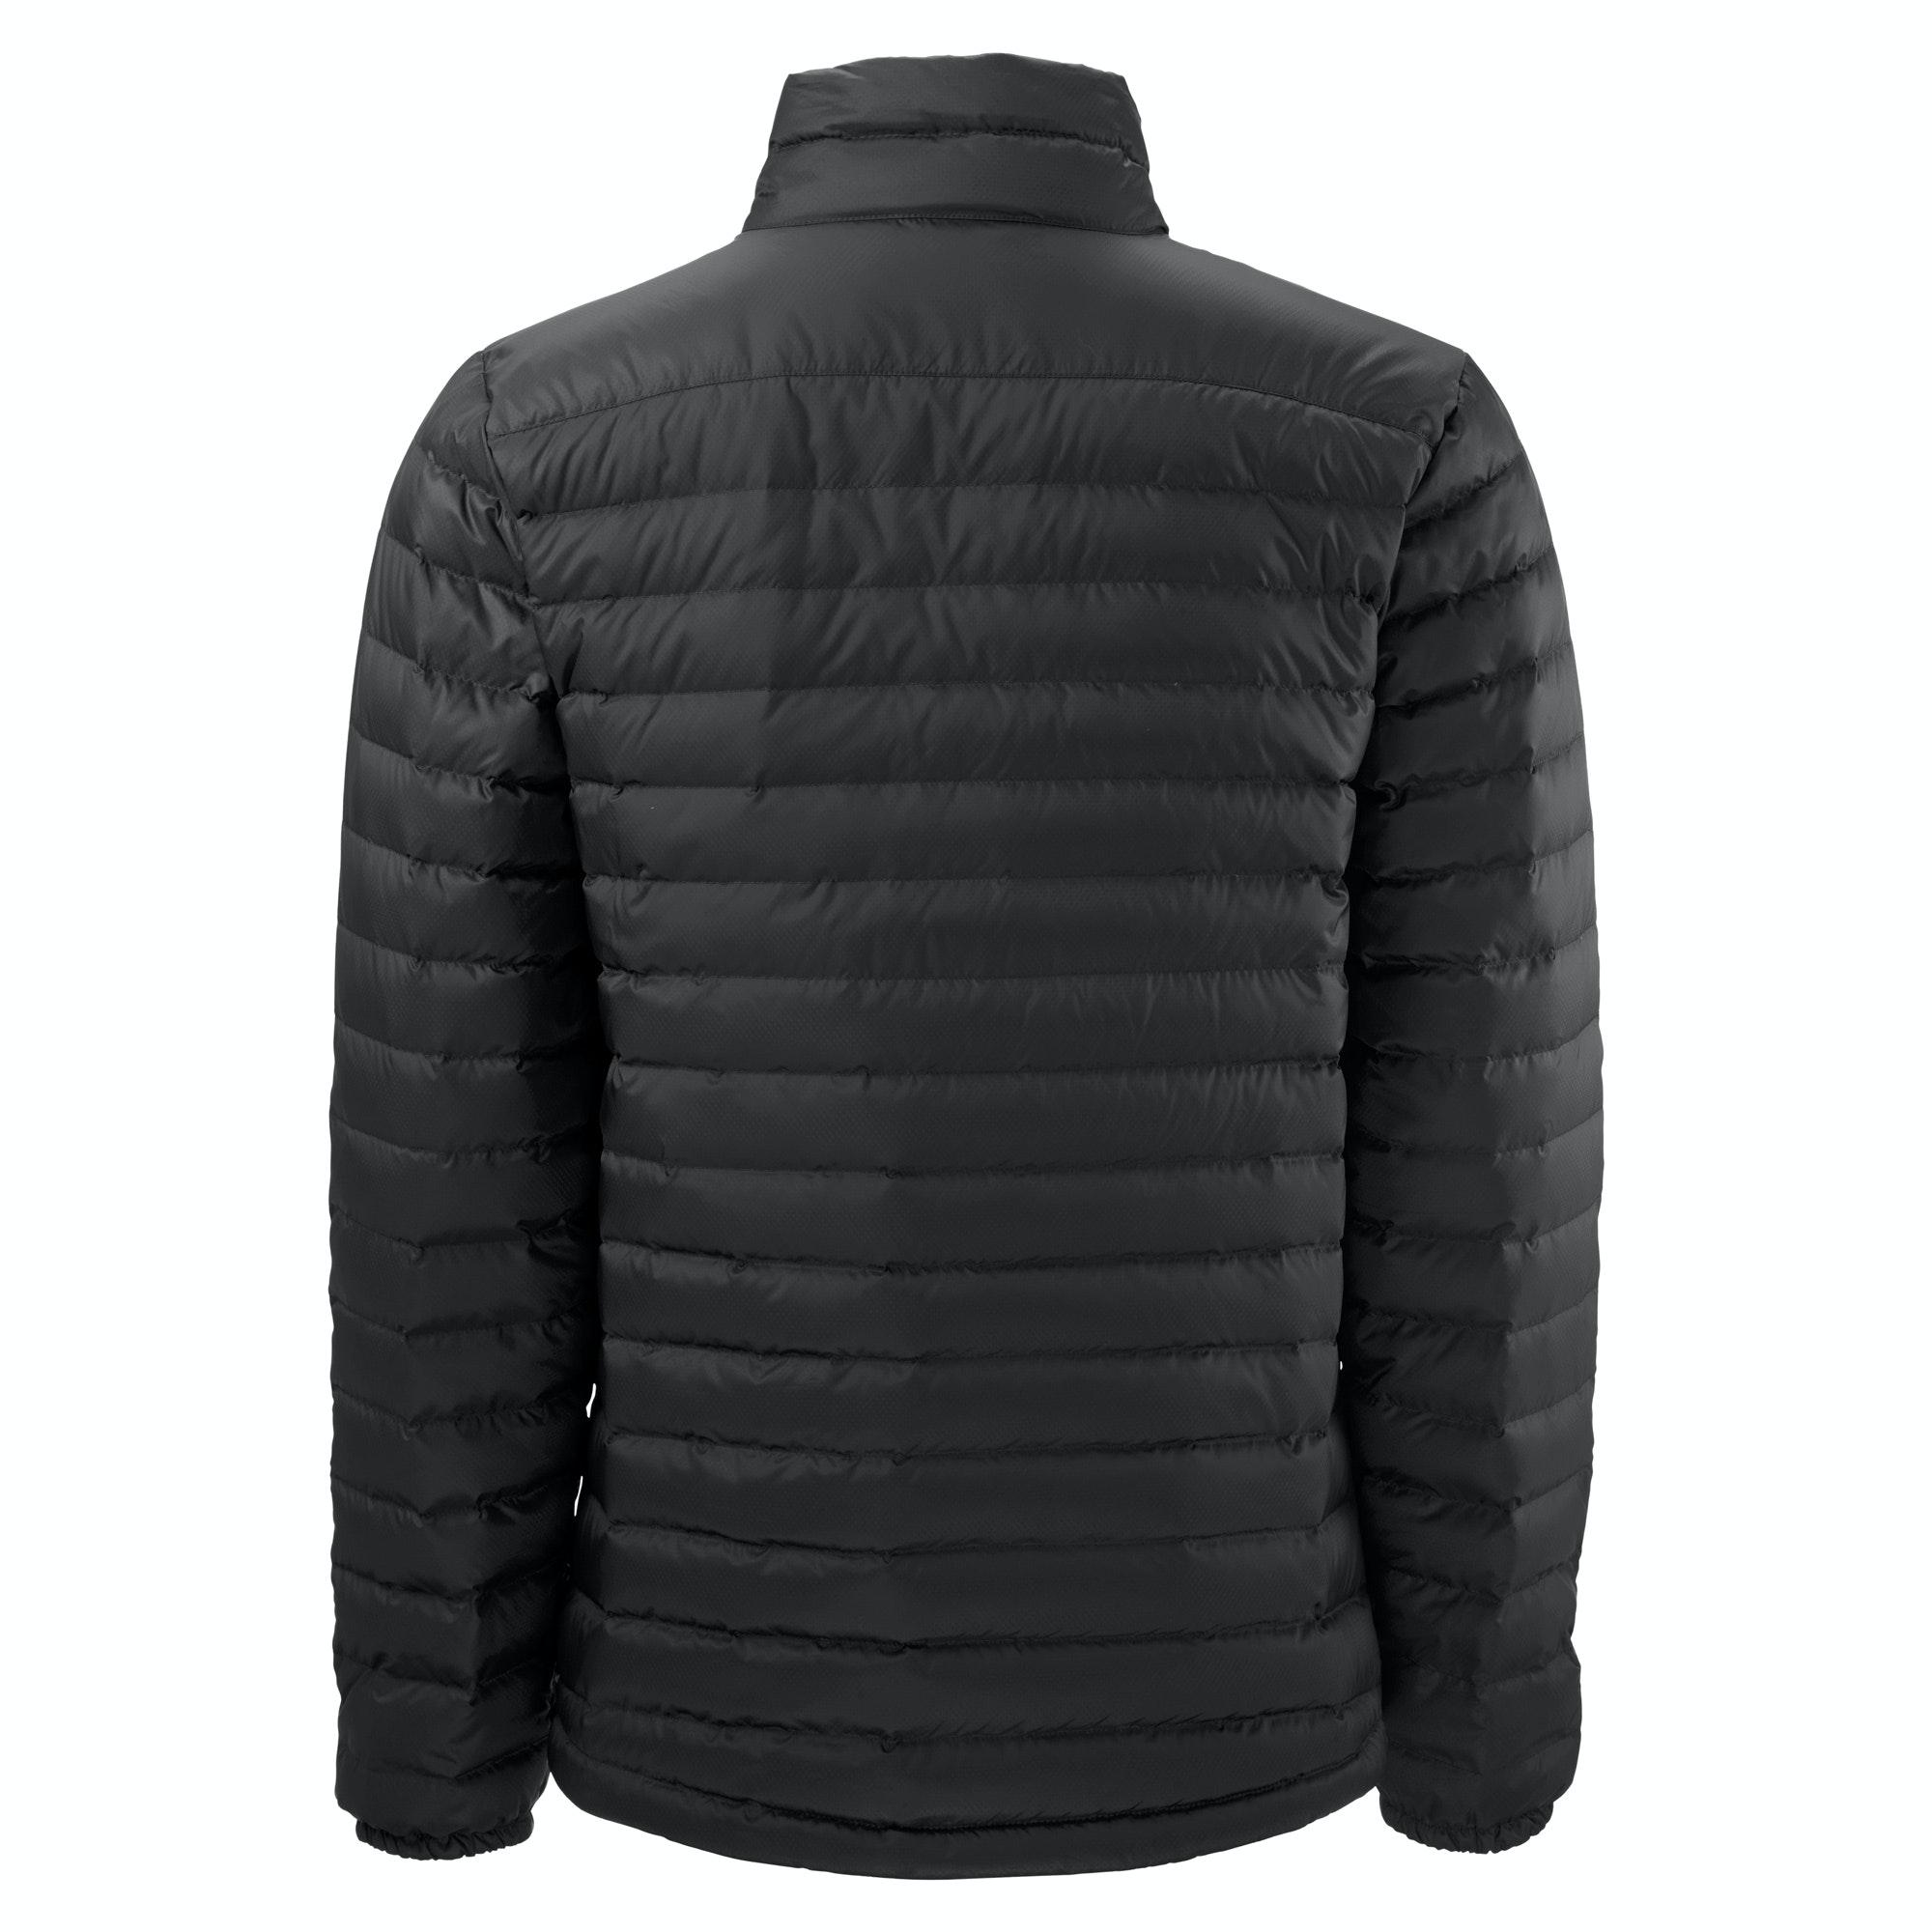 NEW-Kathmandu-Heli-Men-039-s-Lightweight-Duck-Down-Coat-Warm-Puffer-Jacket-v2 thumbnail 10